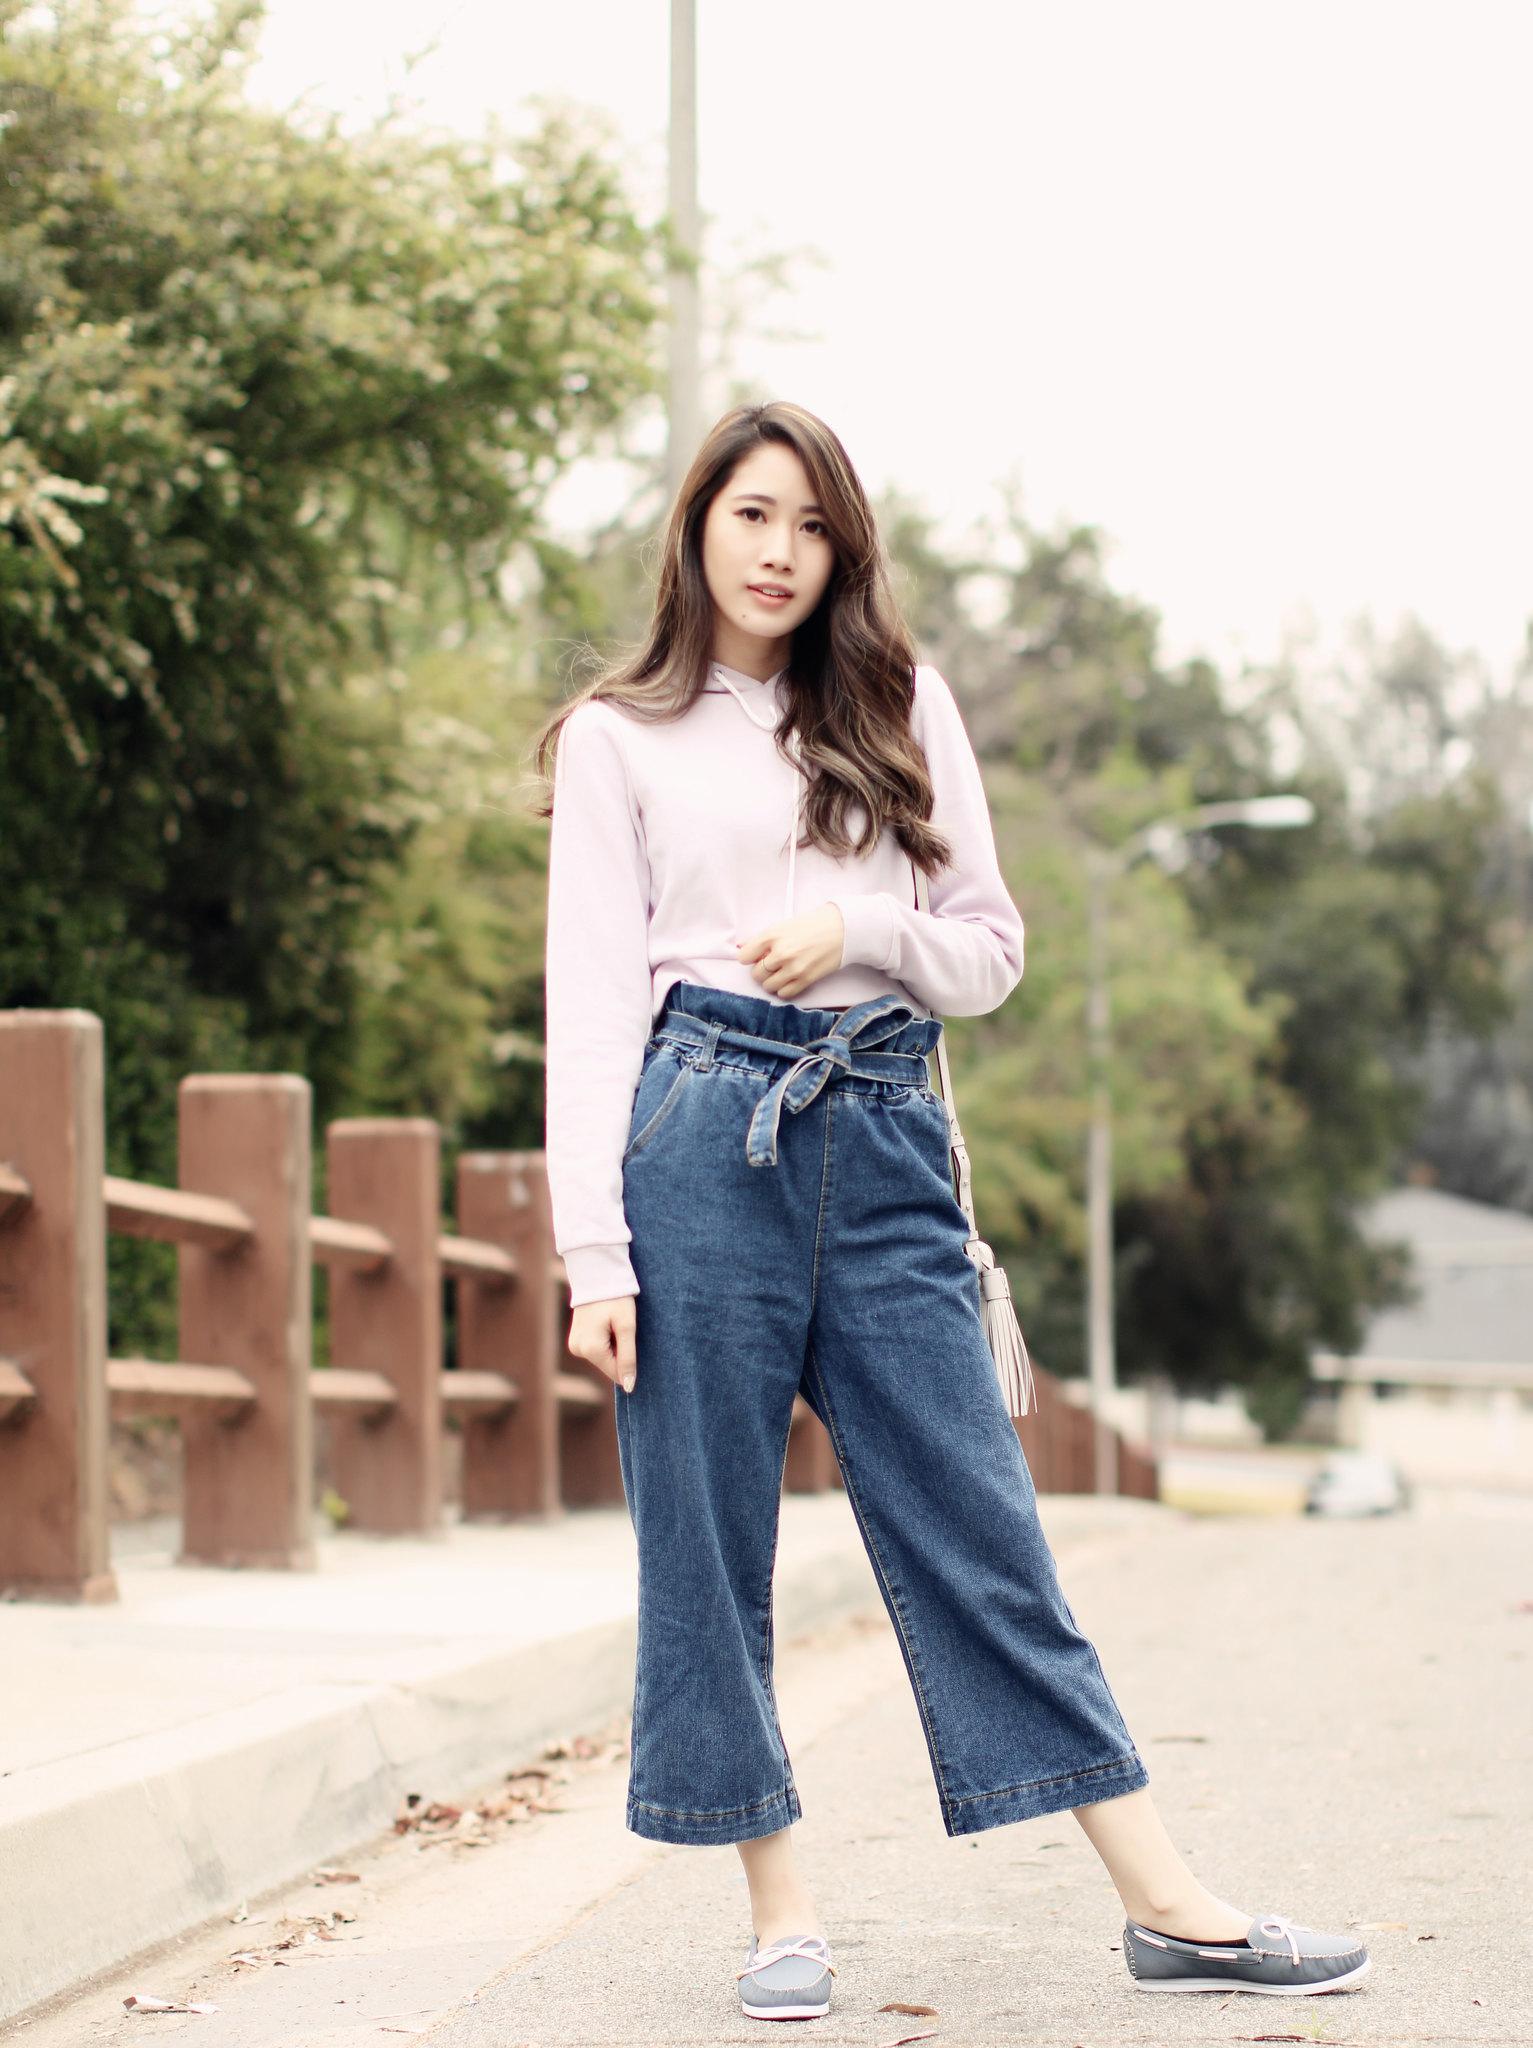 5054-ootd-fashion-style-outfitoftheday-wiwt-streetstyle-zara-f21xme-denim-thrifted-guess-koreanfashion-lookbook-elizabeeetht-clothestoyouuu